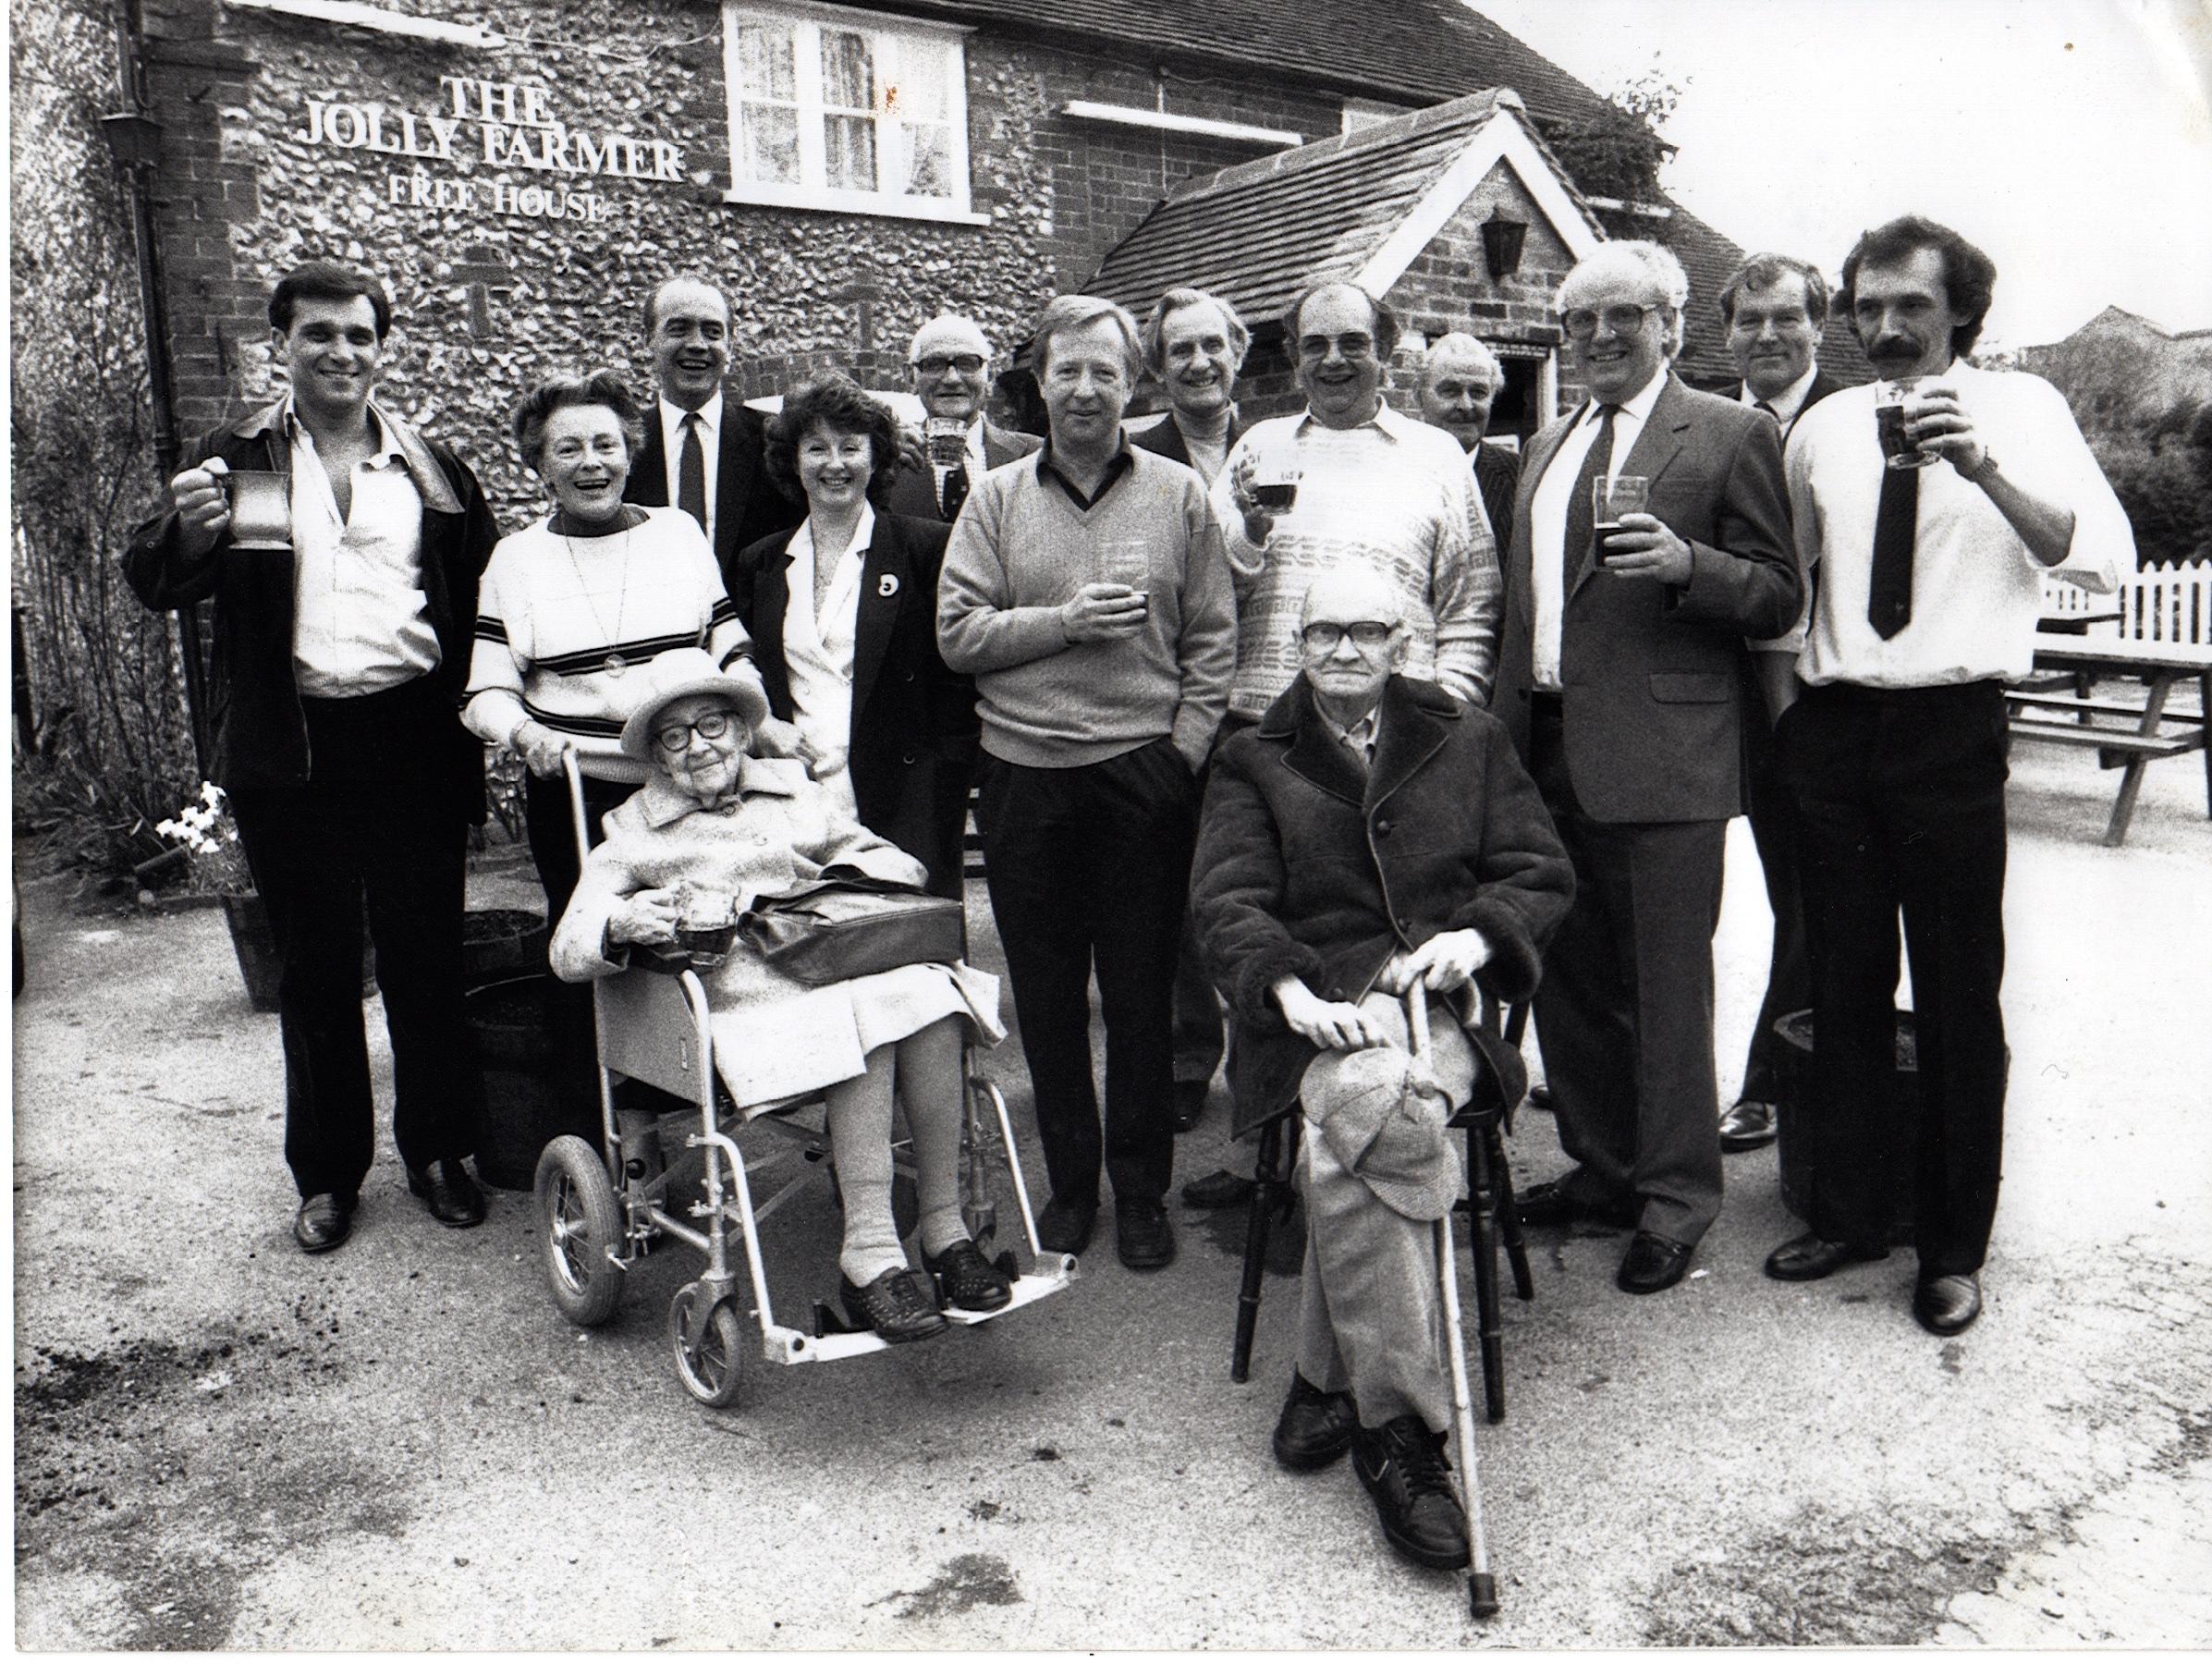 Photo of Orginal Shareholders - B&W - 10 May 1988.jpg